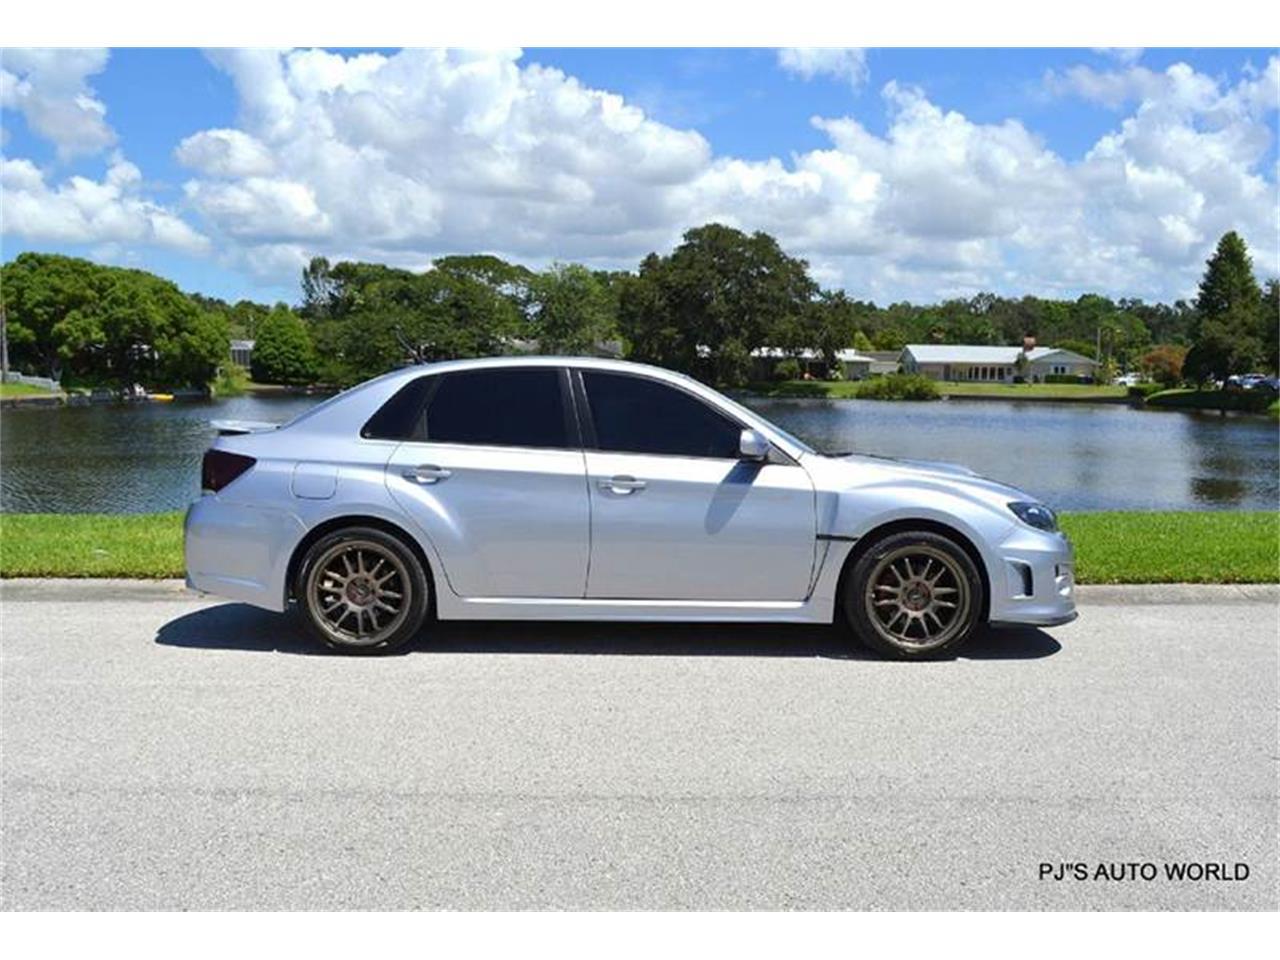 Large Picture of '13 Subaru Impreza located in Clearwater Florida - J6WM